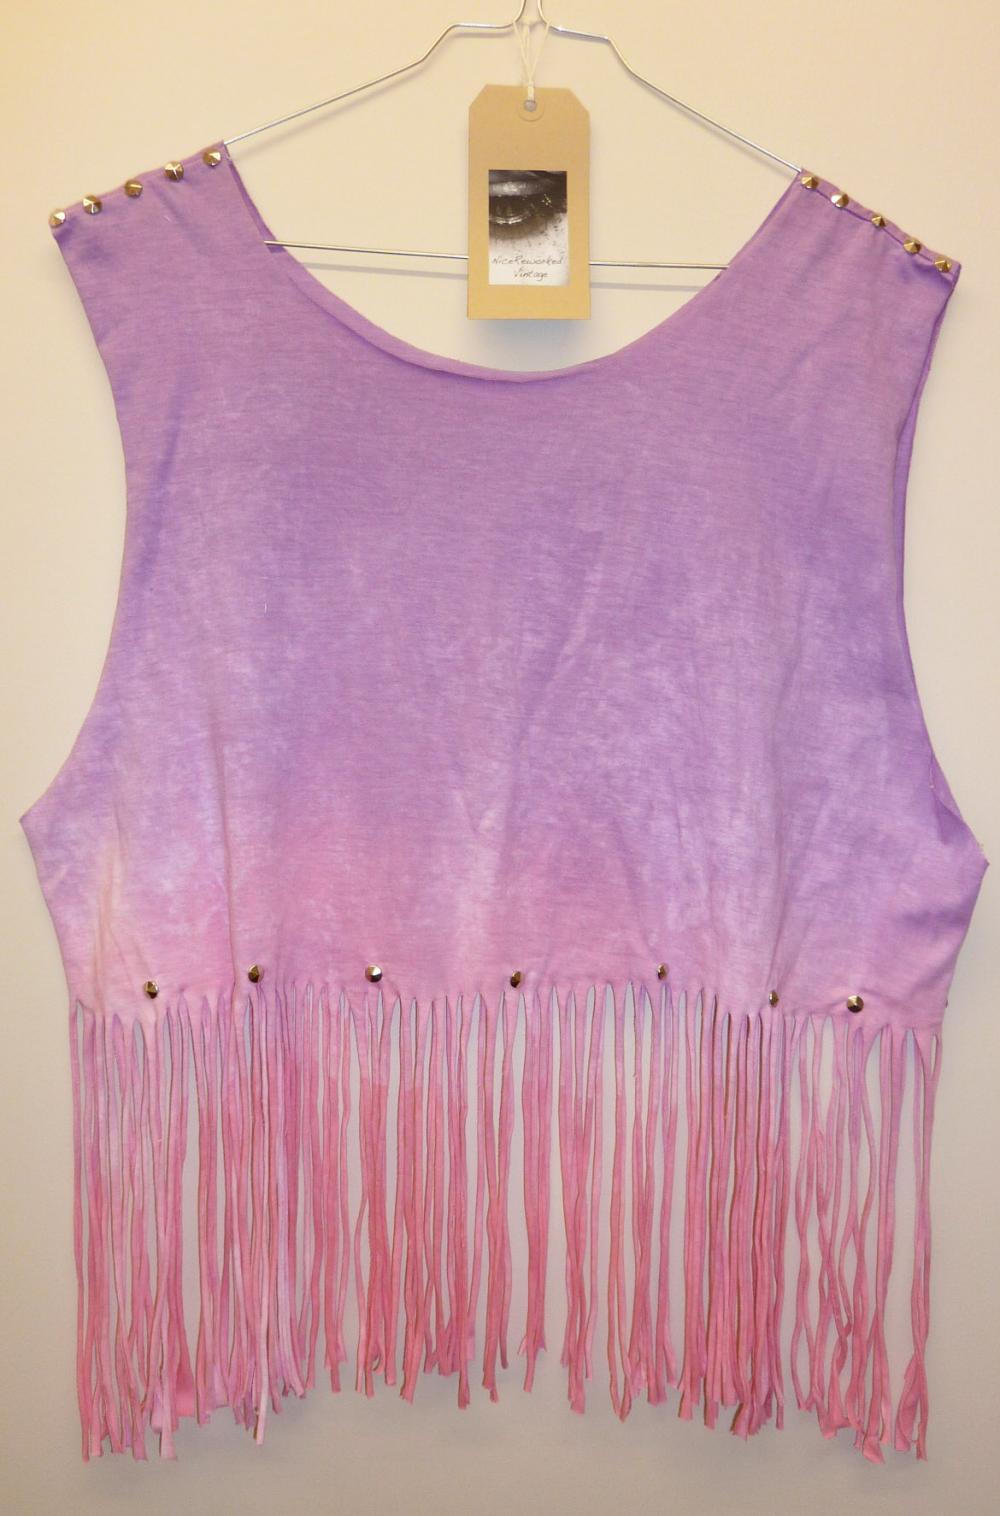 Vintage Dip Tie Dye Fringe Tassle Ladies Summer Crop Top Vest Studded Spike Shoulders Oversize